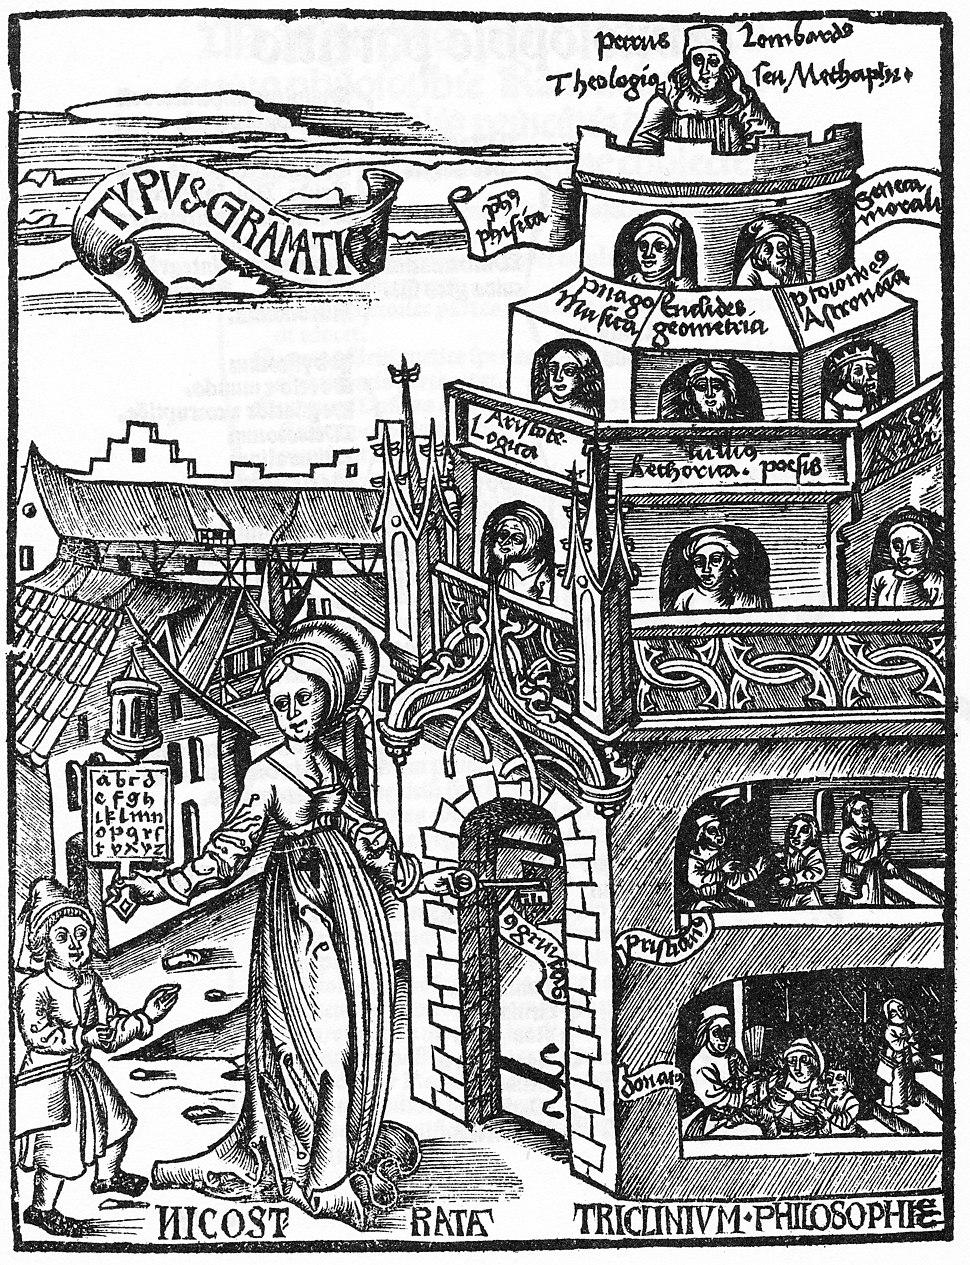 Gregor Reisch - Margarita philosophica - 4th ed. Basel 1517 - p. VI - Typus grammaticae - 500ppi